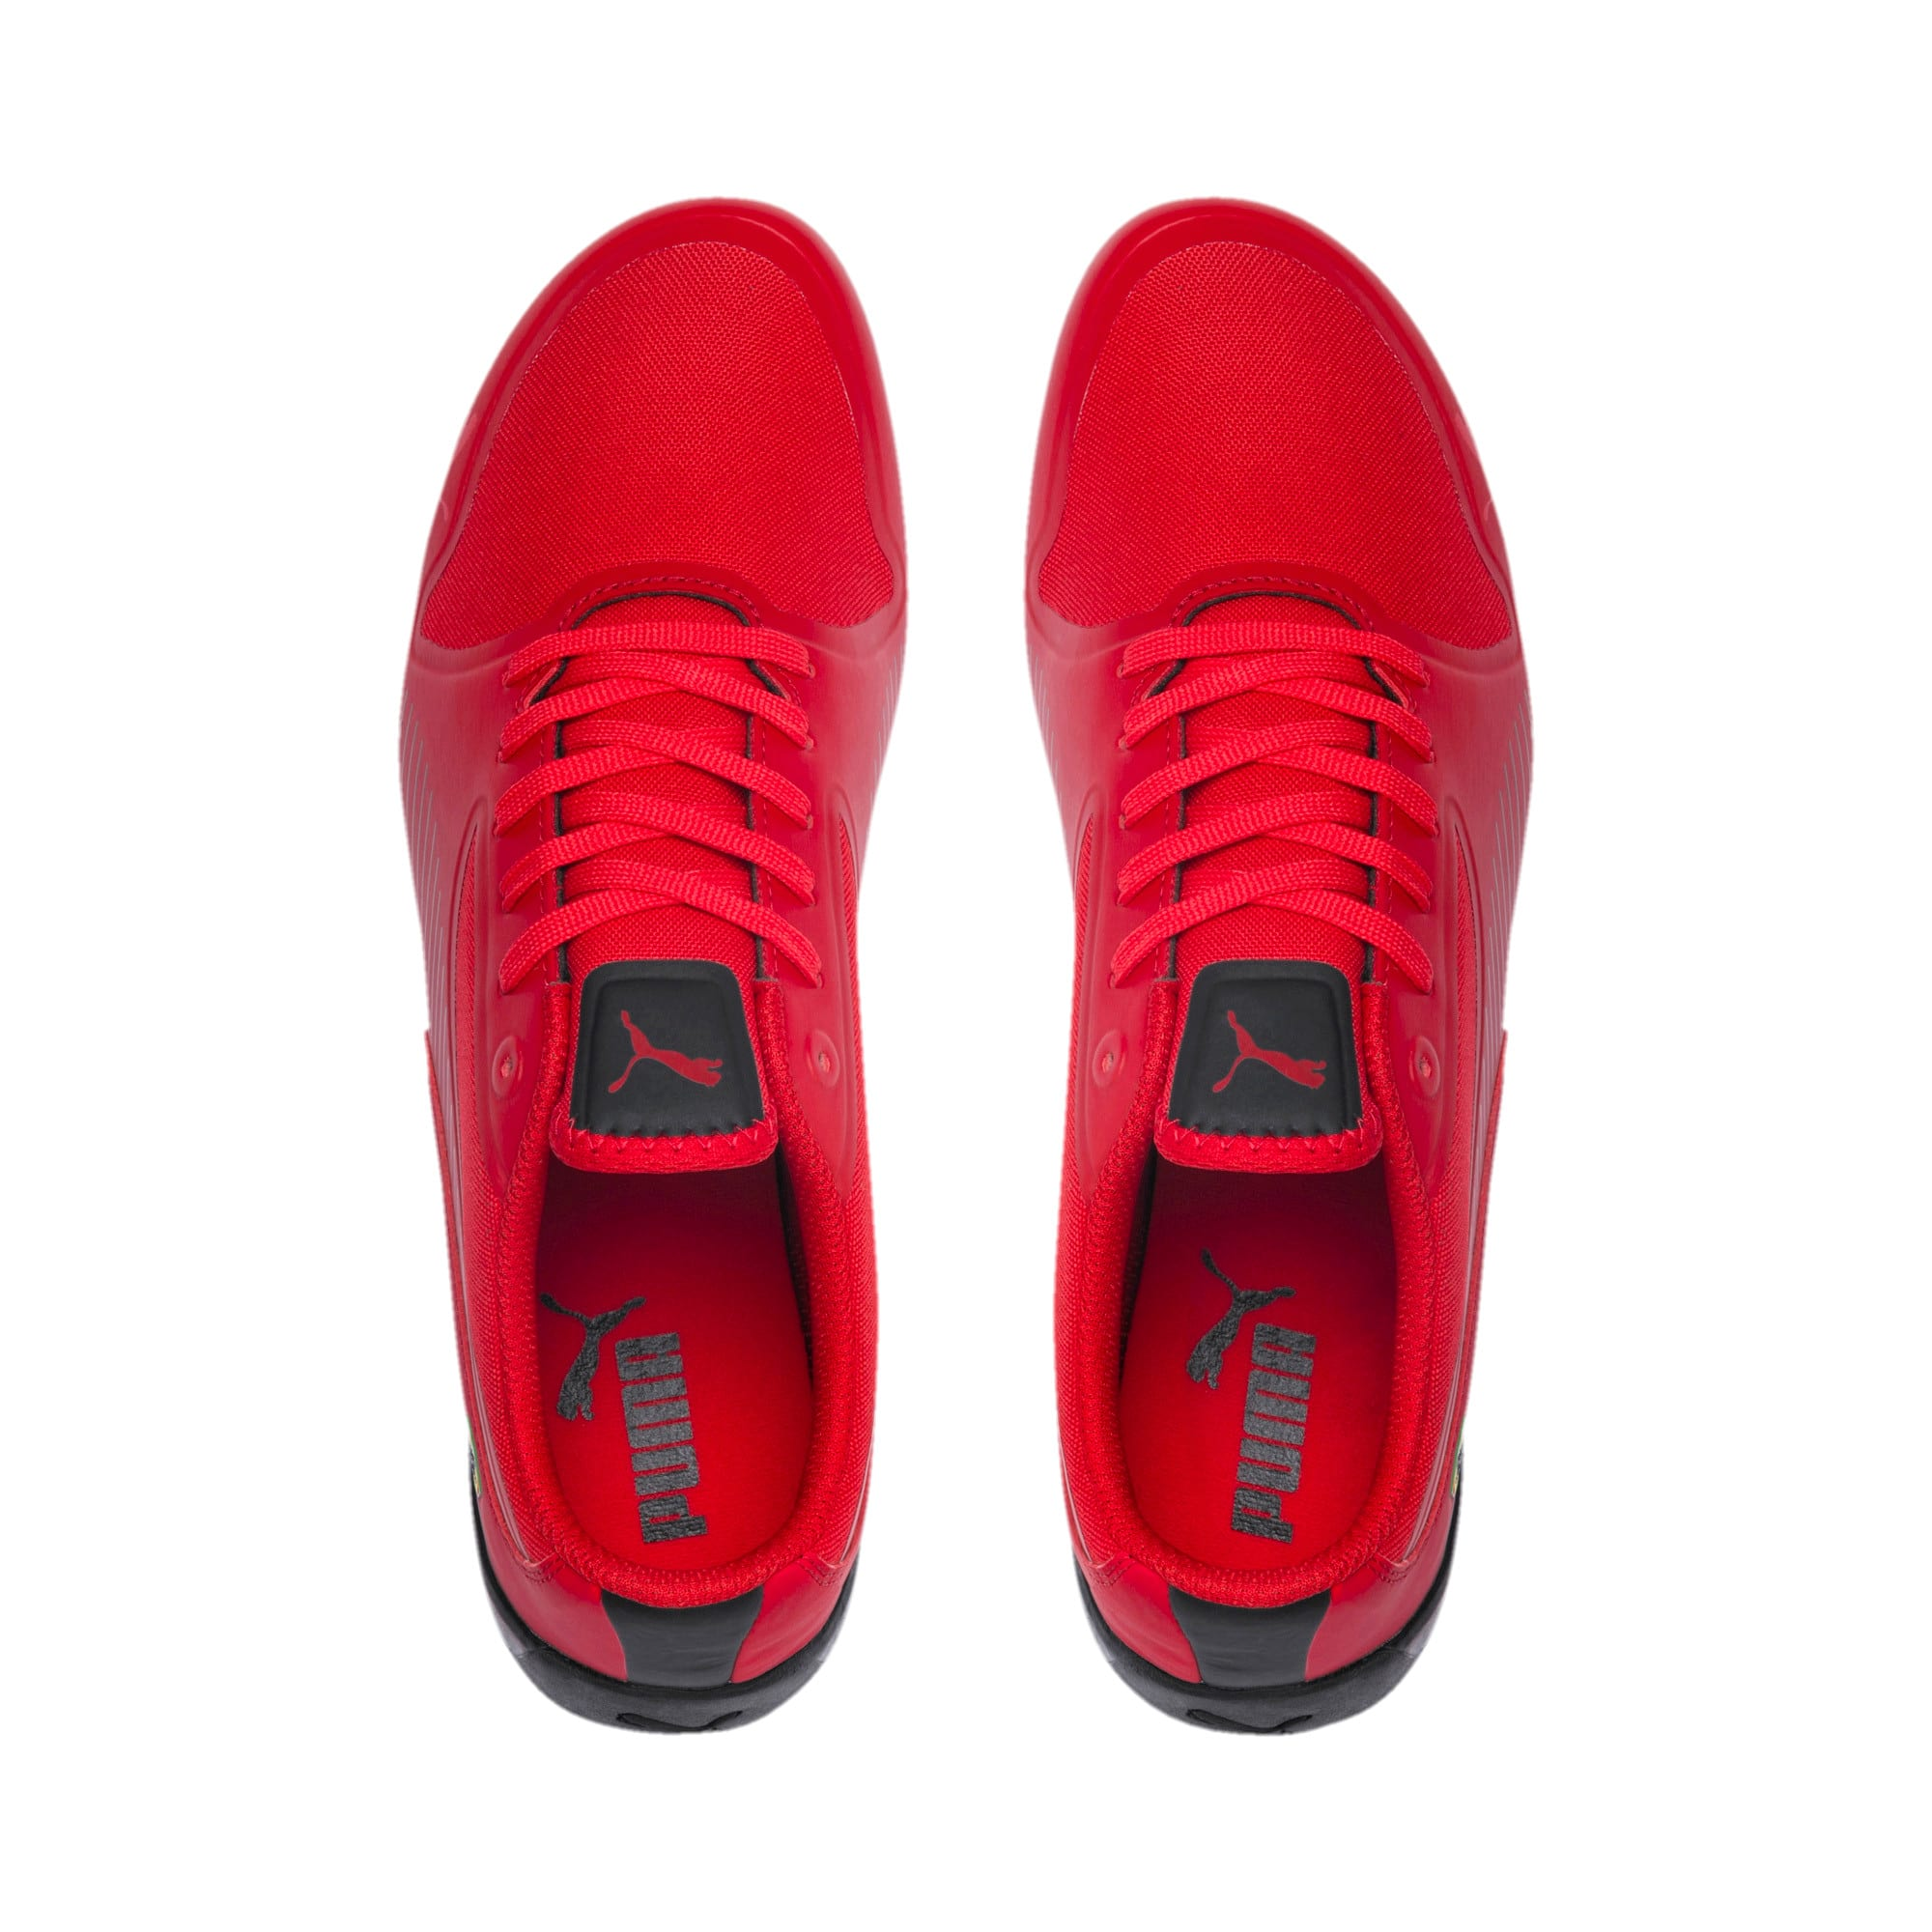 Thumbnail 6 of Scuderia Ferrari Drift Cat 7 Ultra Shoes, Rosso Corsa-Puma Black, medium